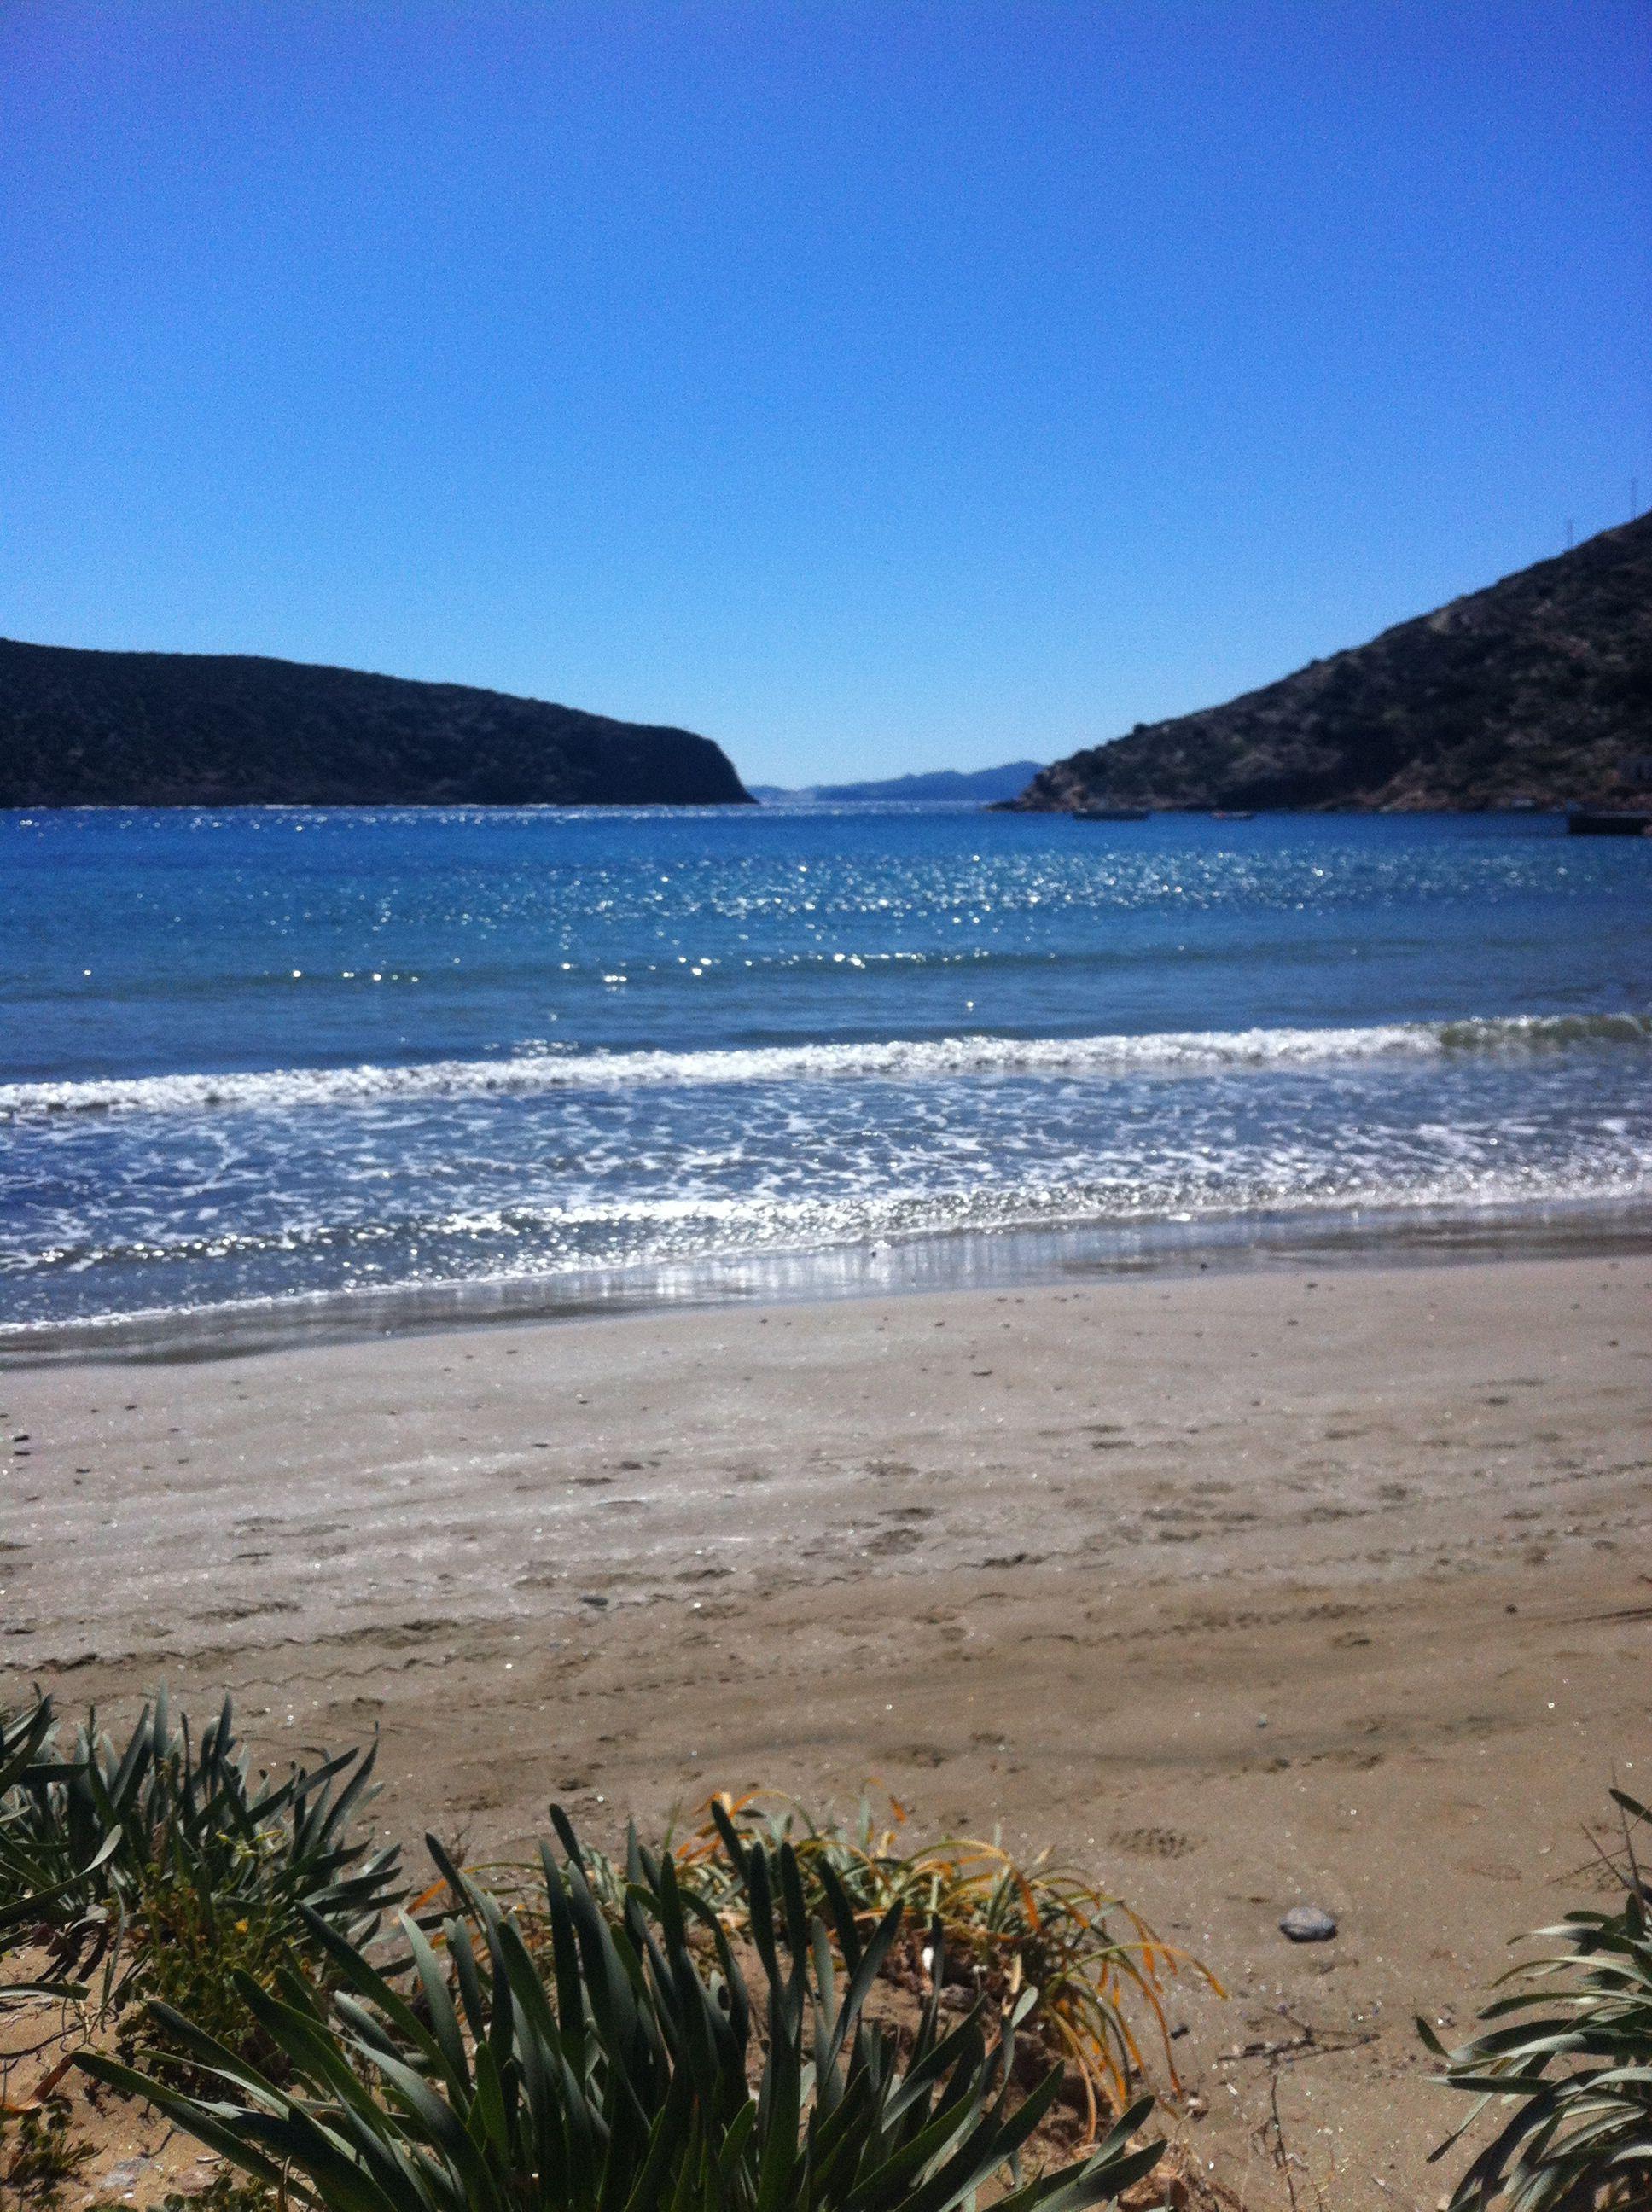 Vathy Sifnos island Greece